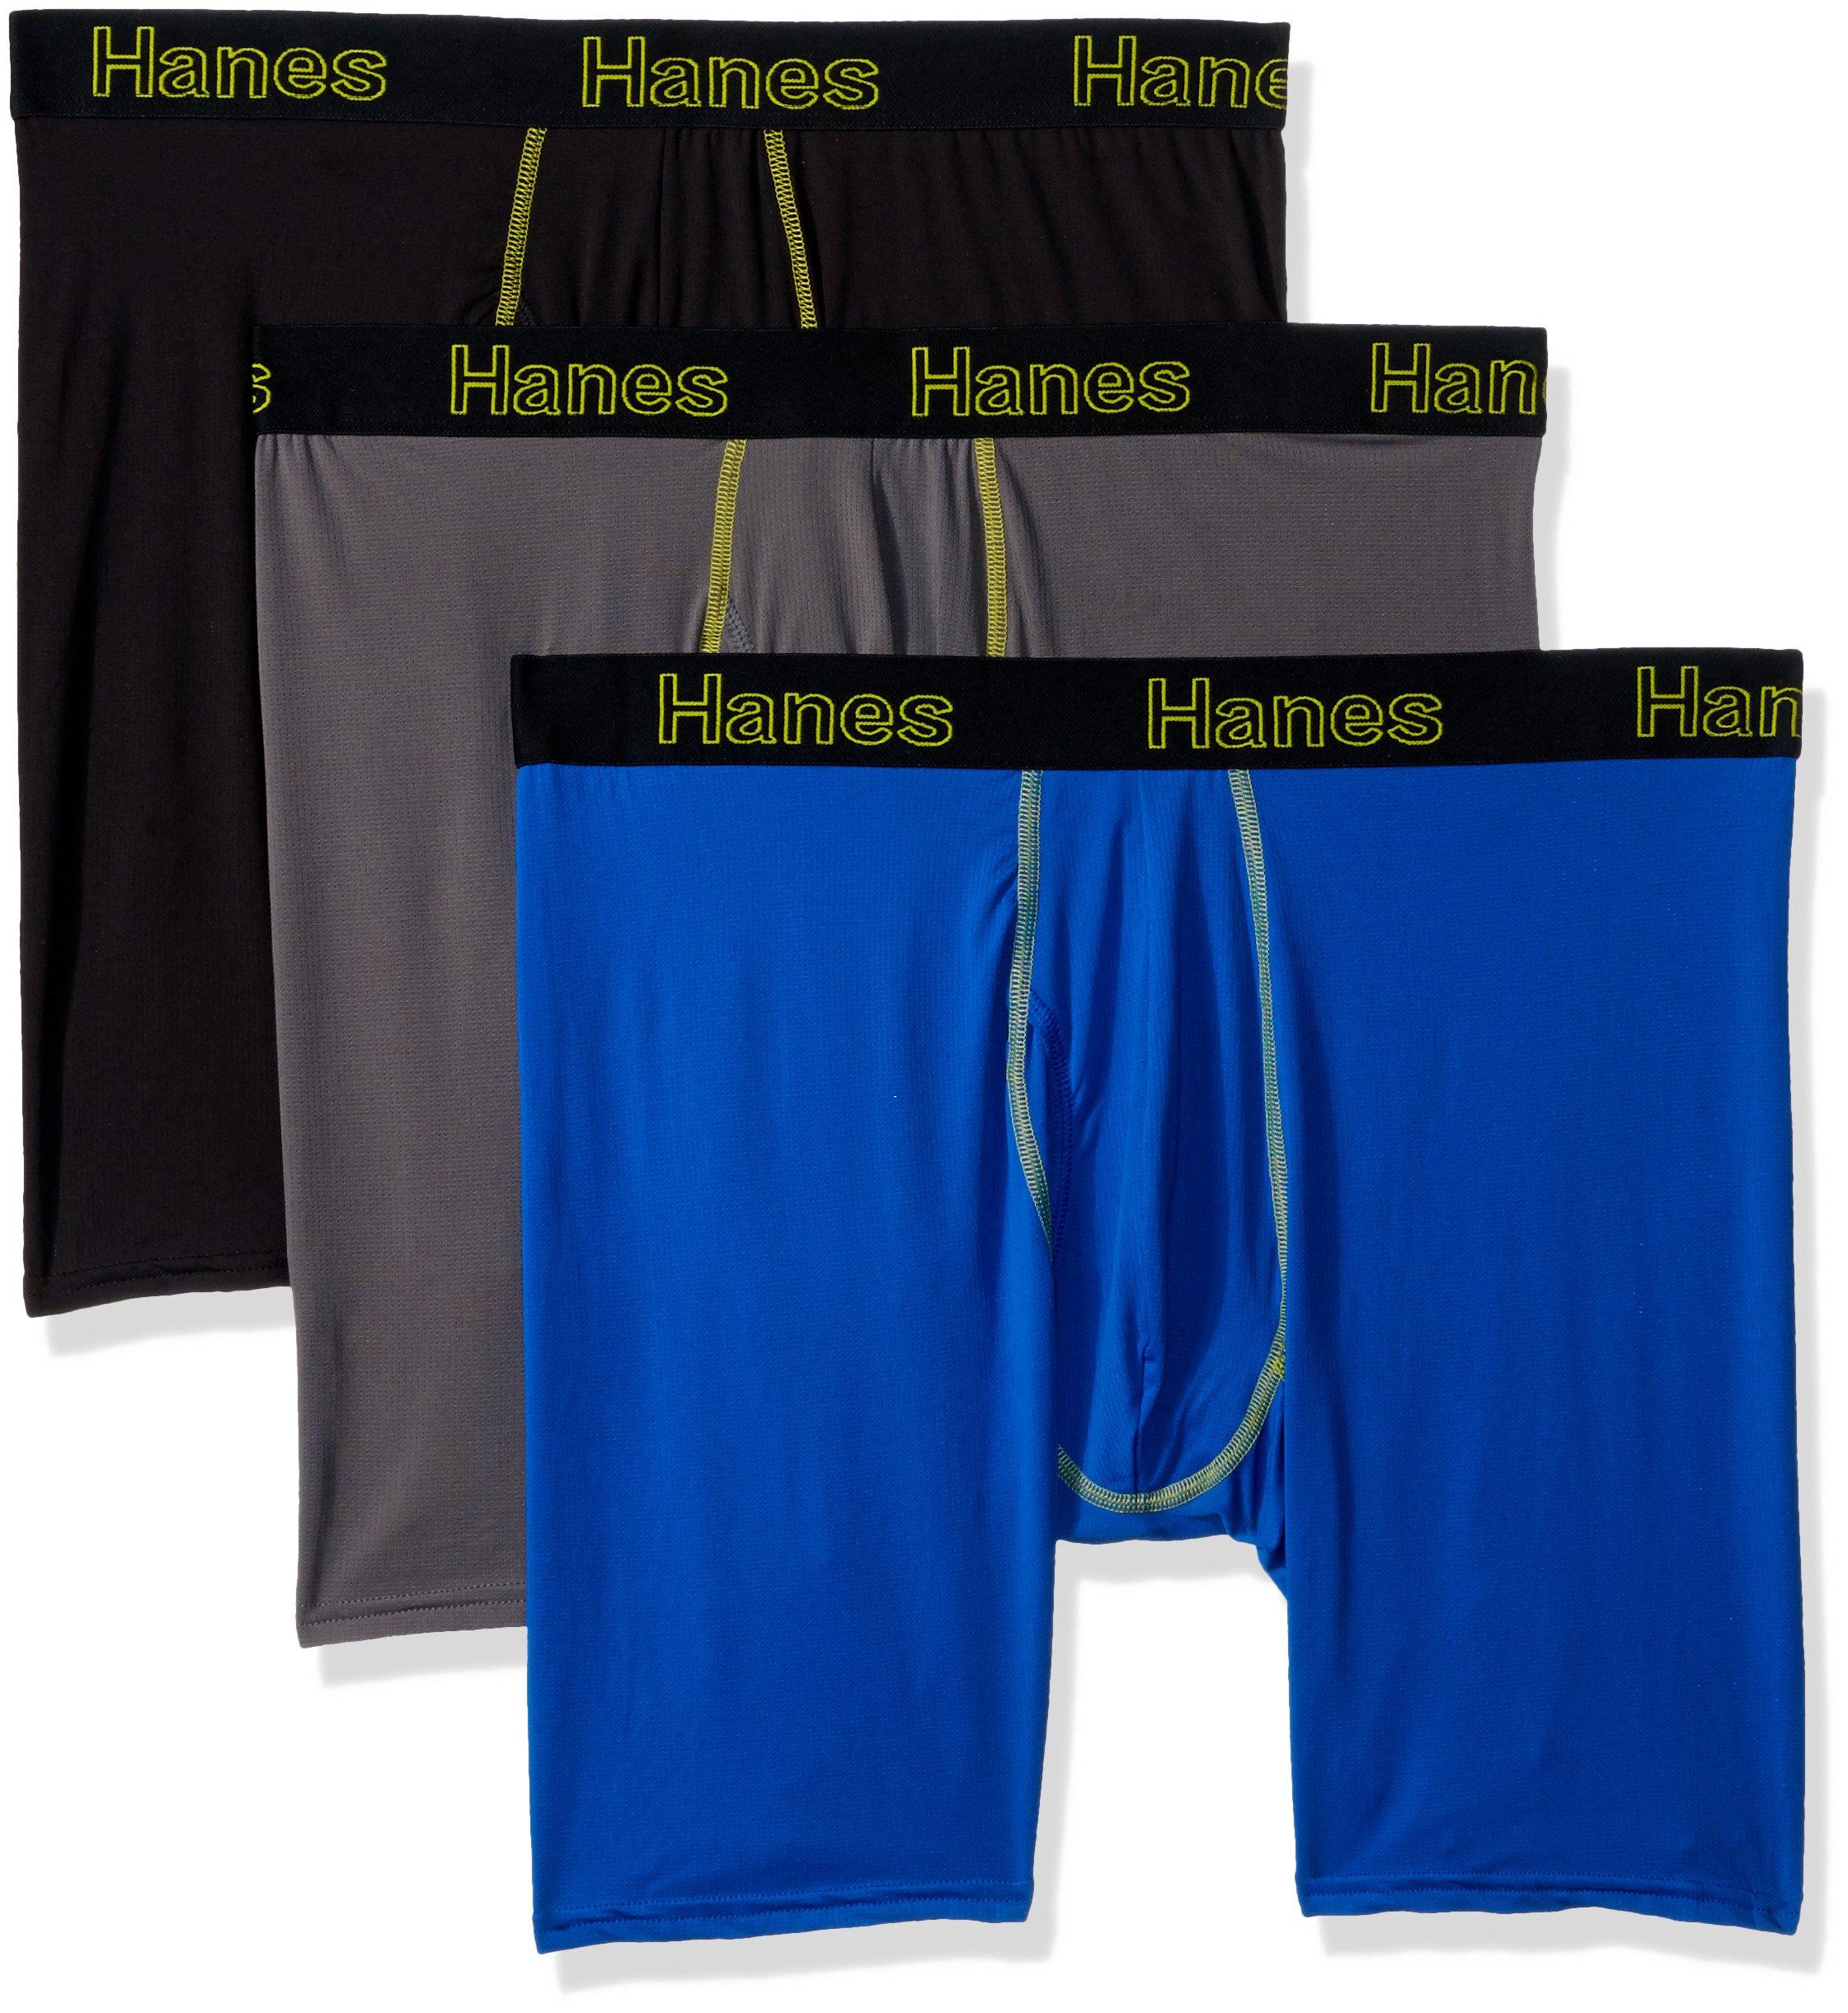 Hanes Men's 3-Pack Comfort Flex Fit Ultra Lightweight Mesh Boxer Brief, Assorted, Large